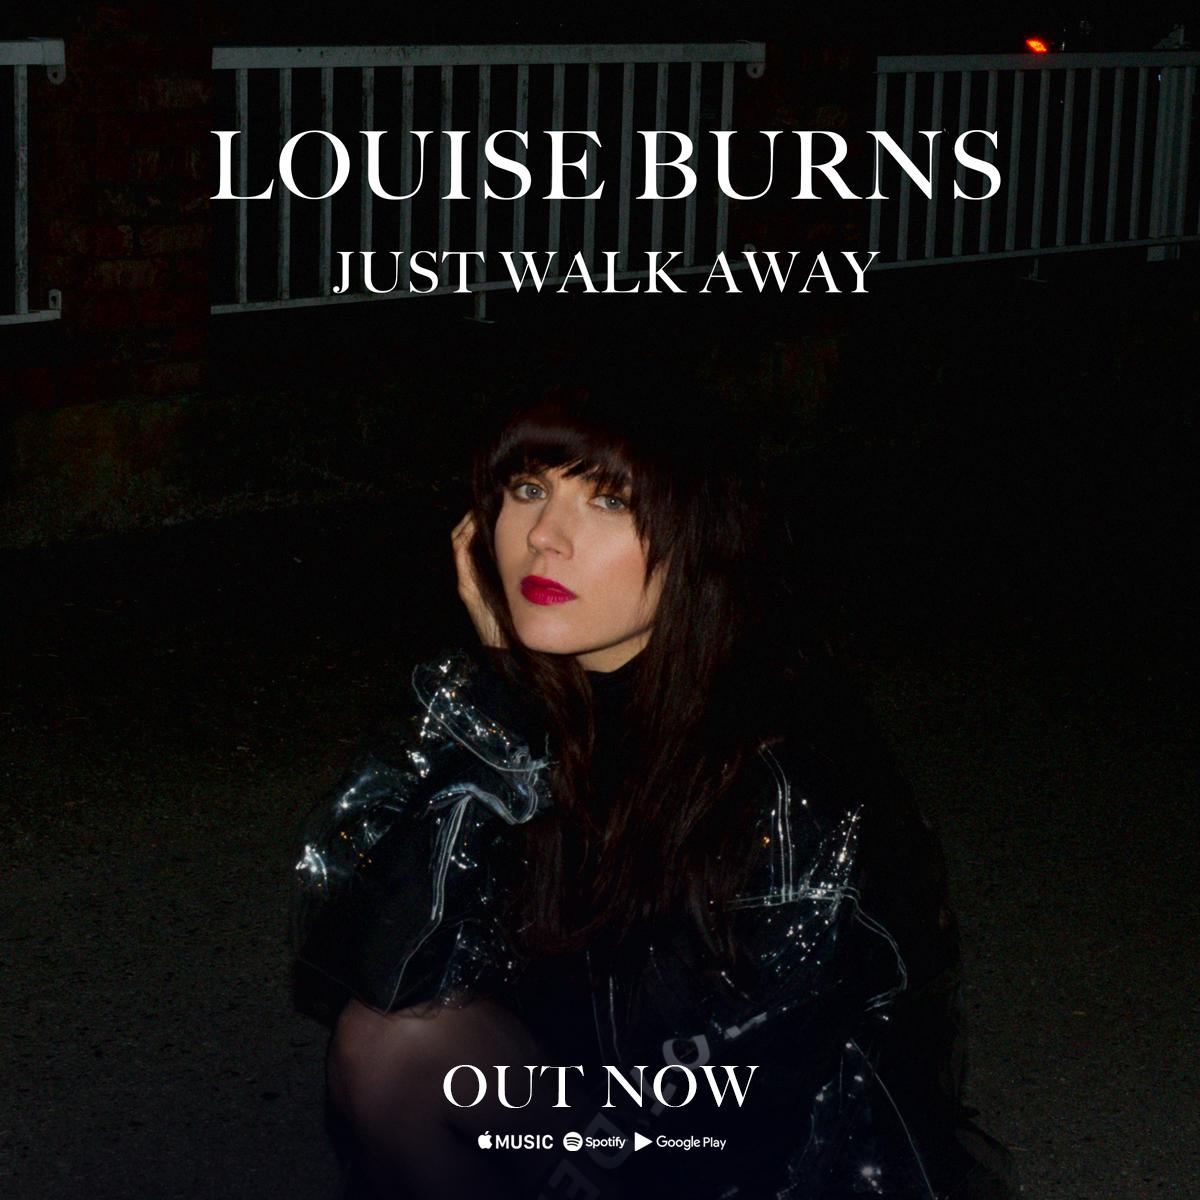 LouiseBurns_JustWalkAway_IG.jpg